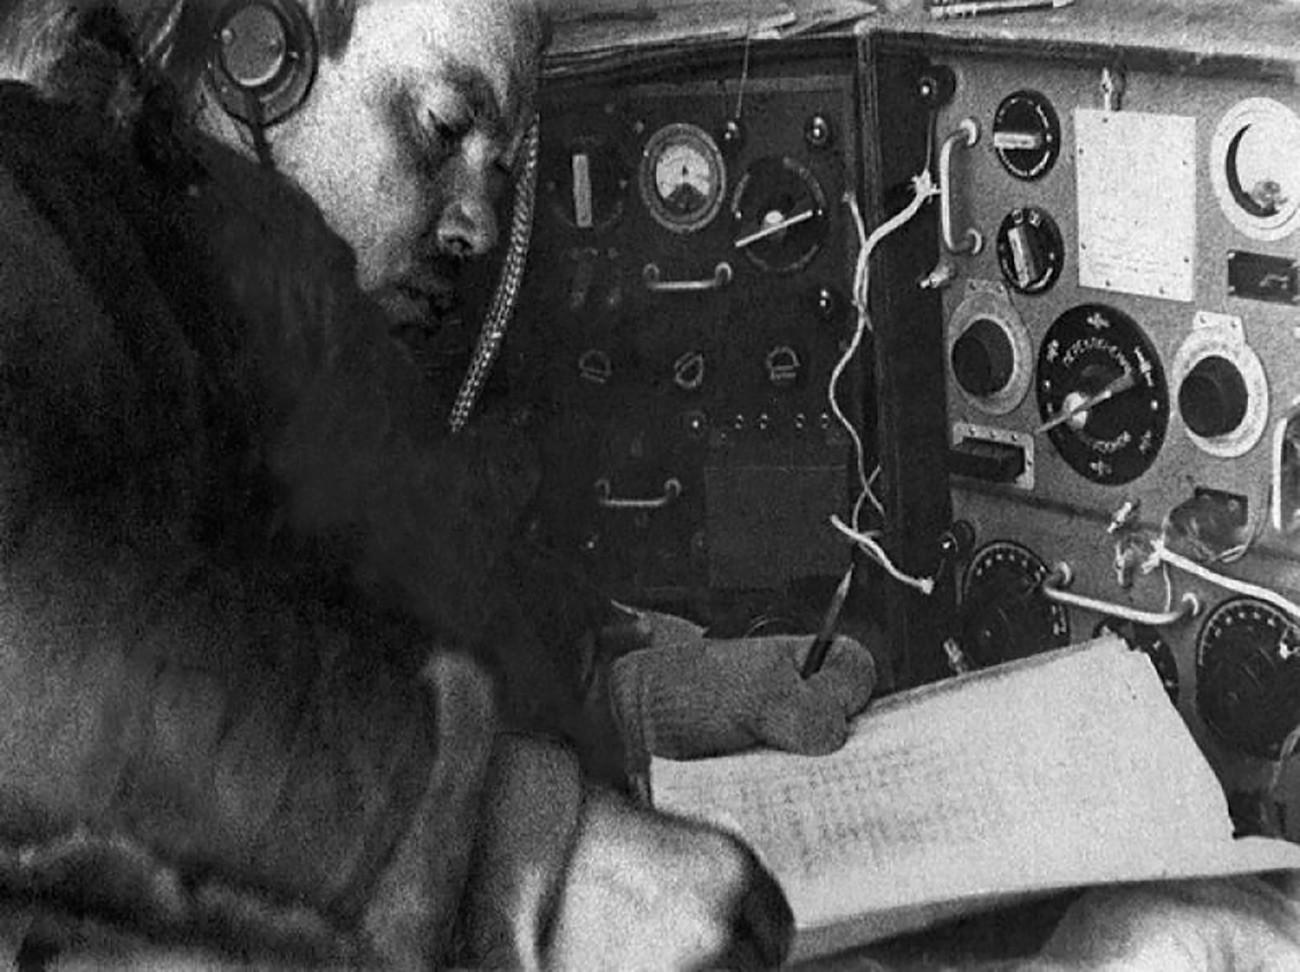 Radist Ernst Krenkelj, stanica